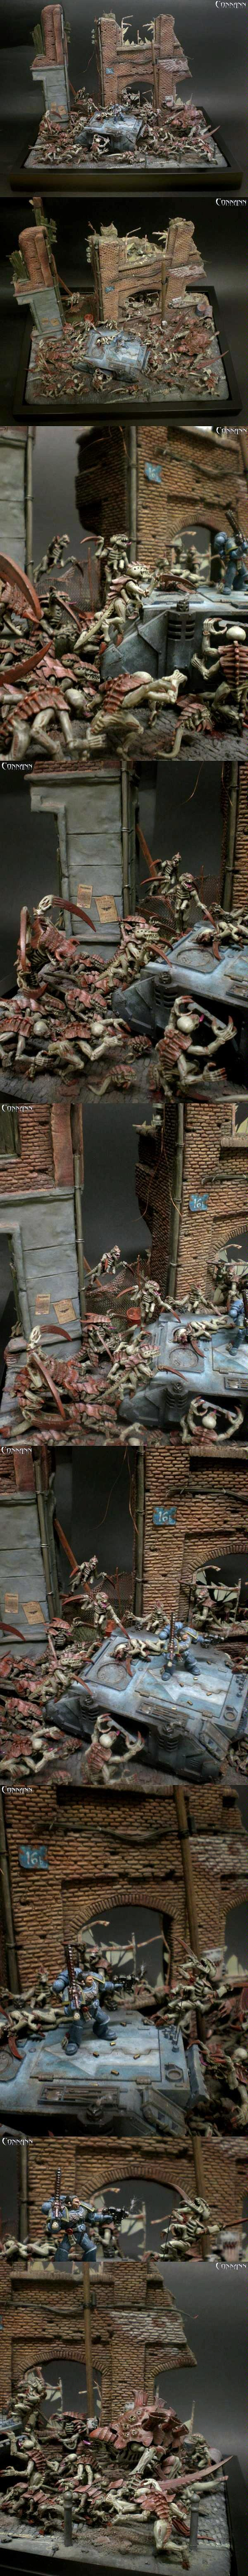 Diorama, Gi, Rhino, Terrain, Tyranids, Ultramar, Ultramarines